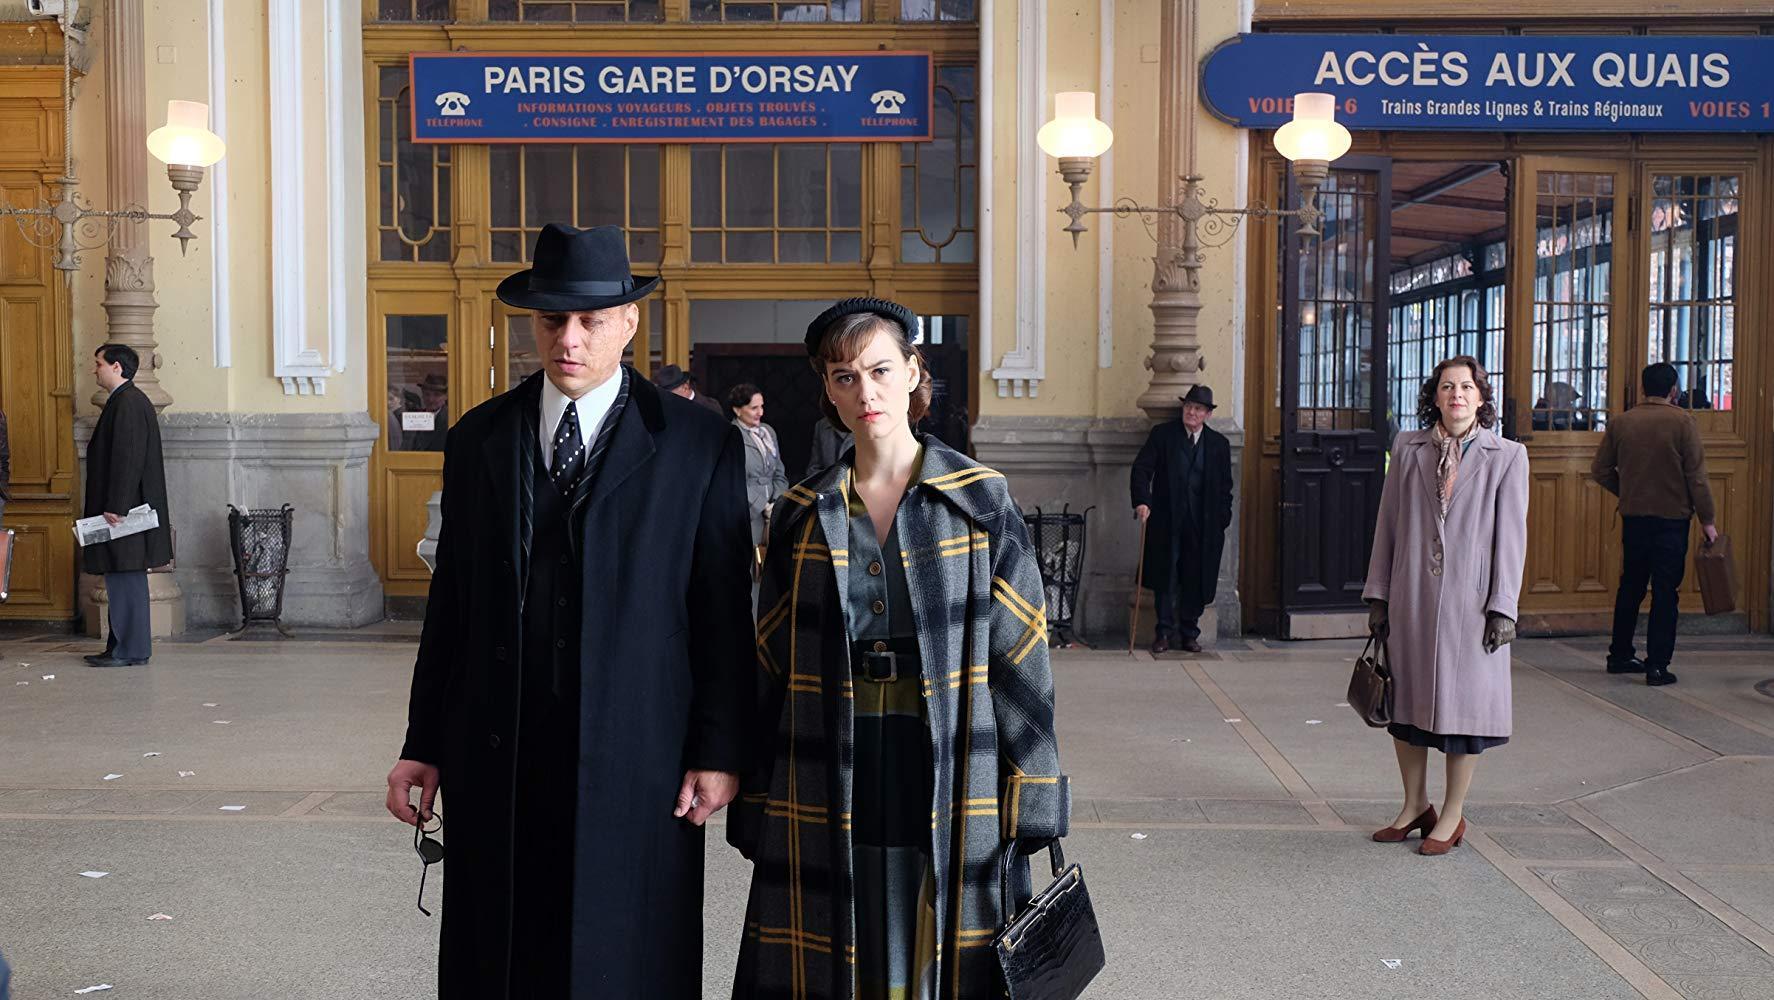 مشاهدة فيلم Maigret Night at the Crossroads 2017 HD مترجم كامل اون لاين